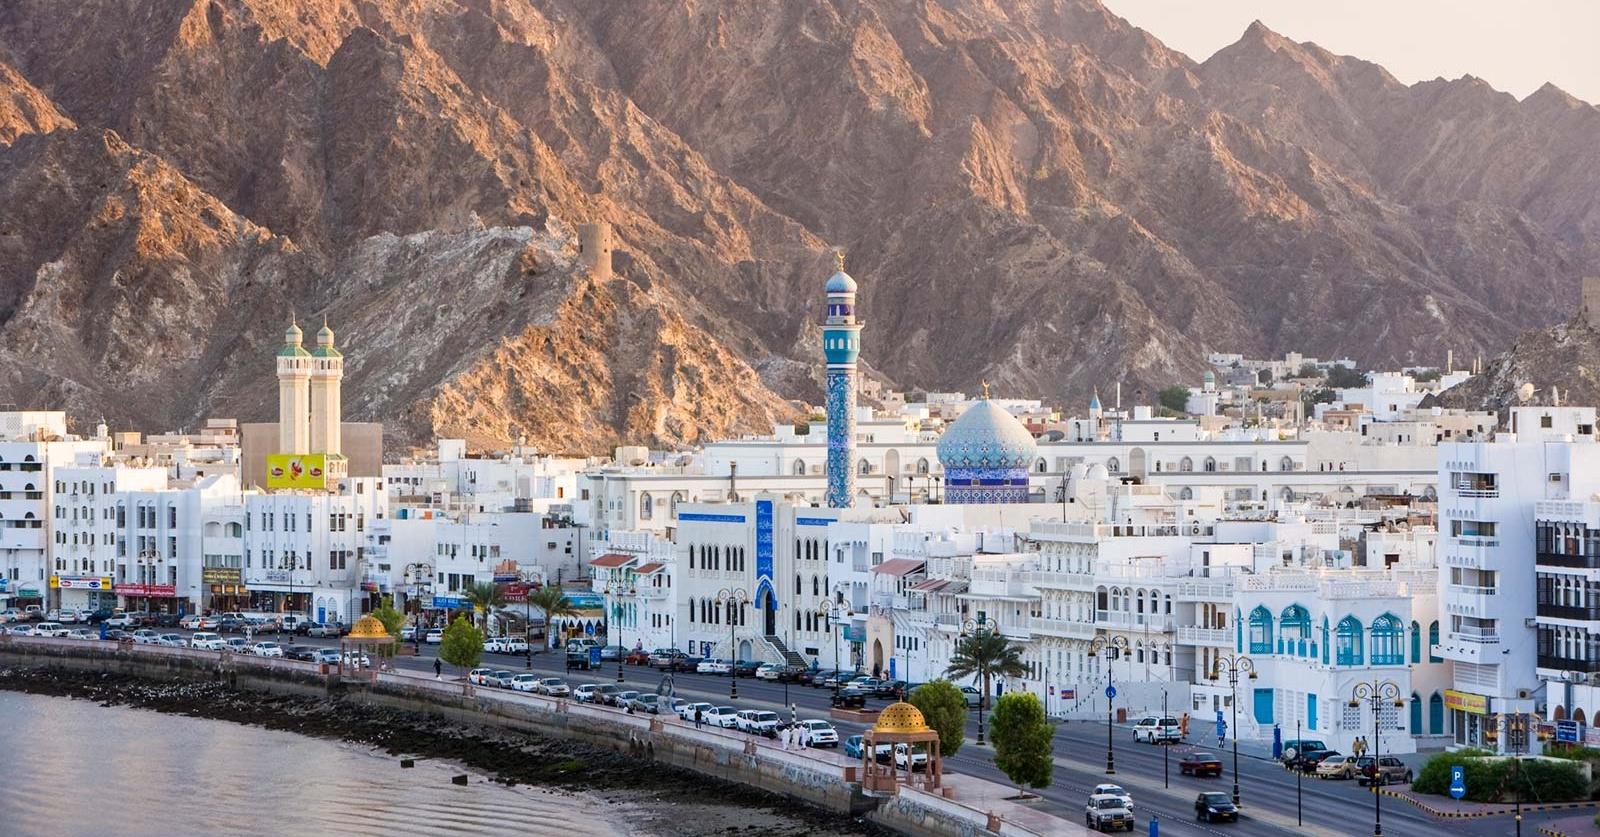 Travel from Dubai to Oman